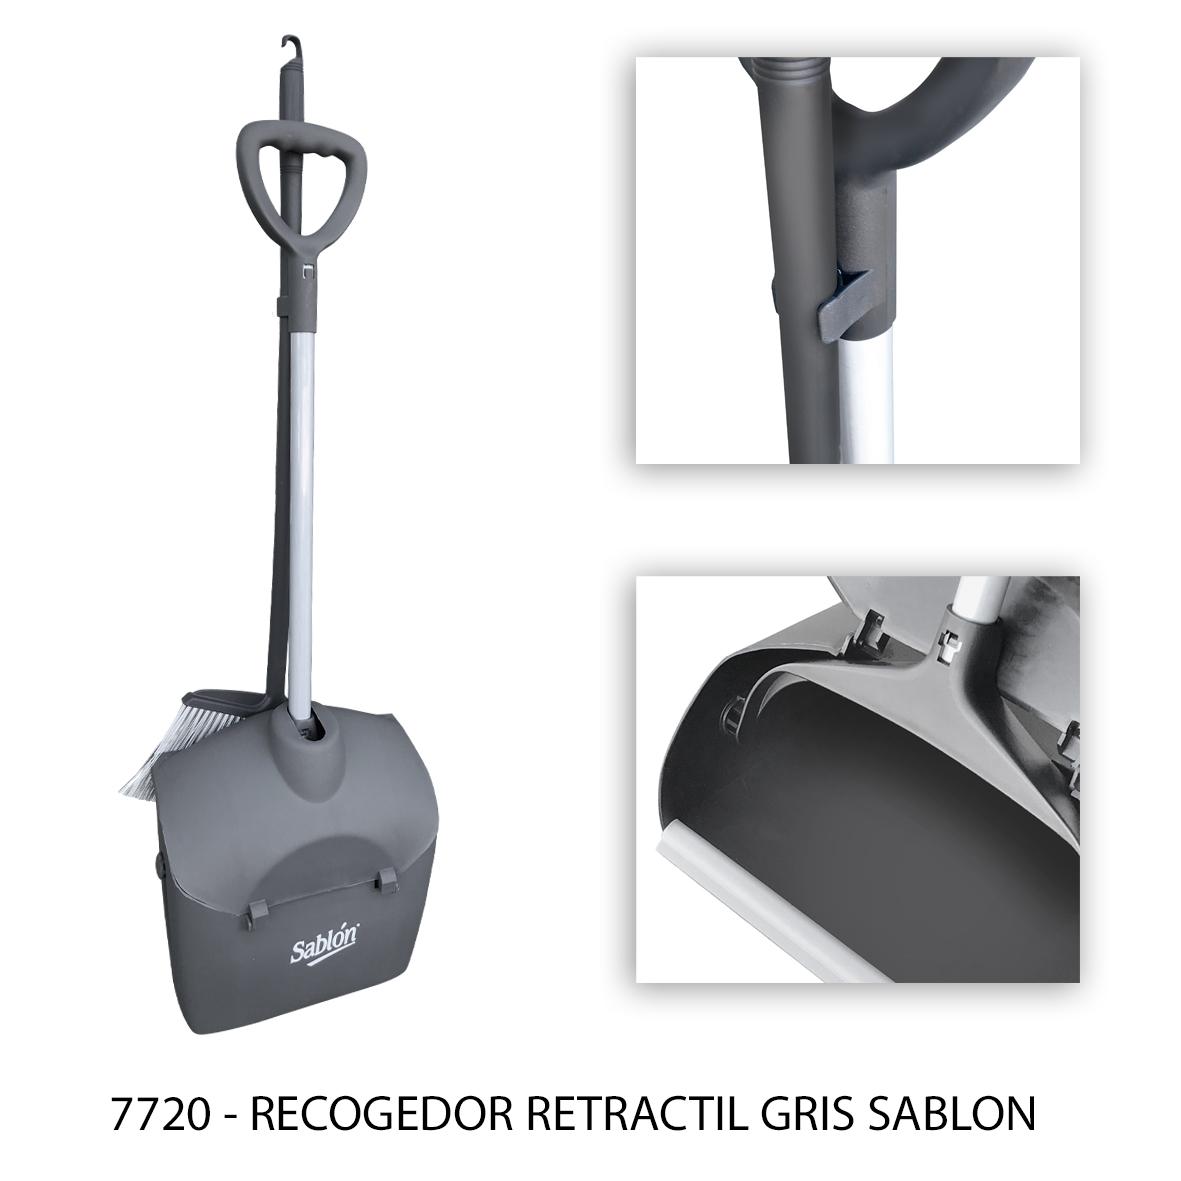 Recogedor de basura retractil gris modelo 7720 - Sablón